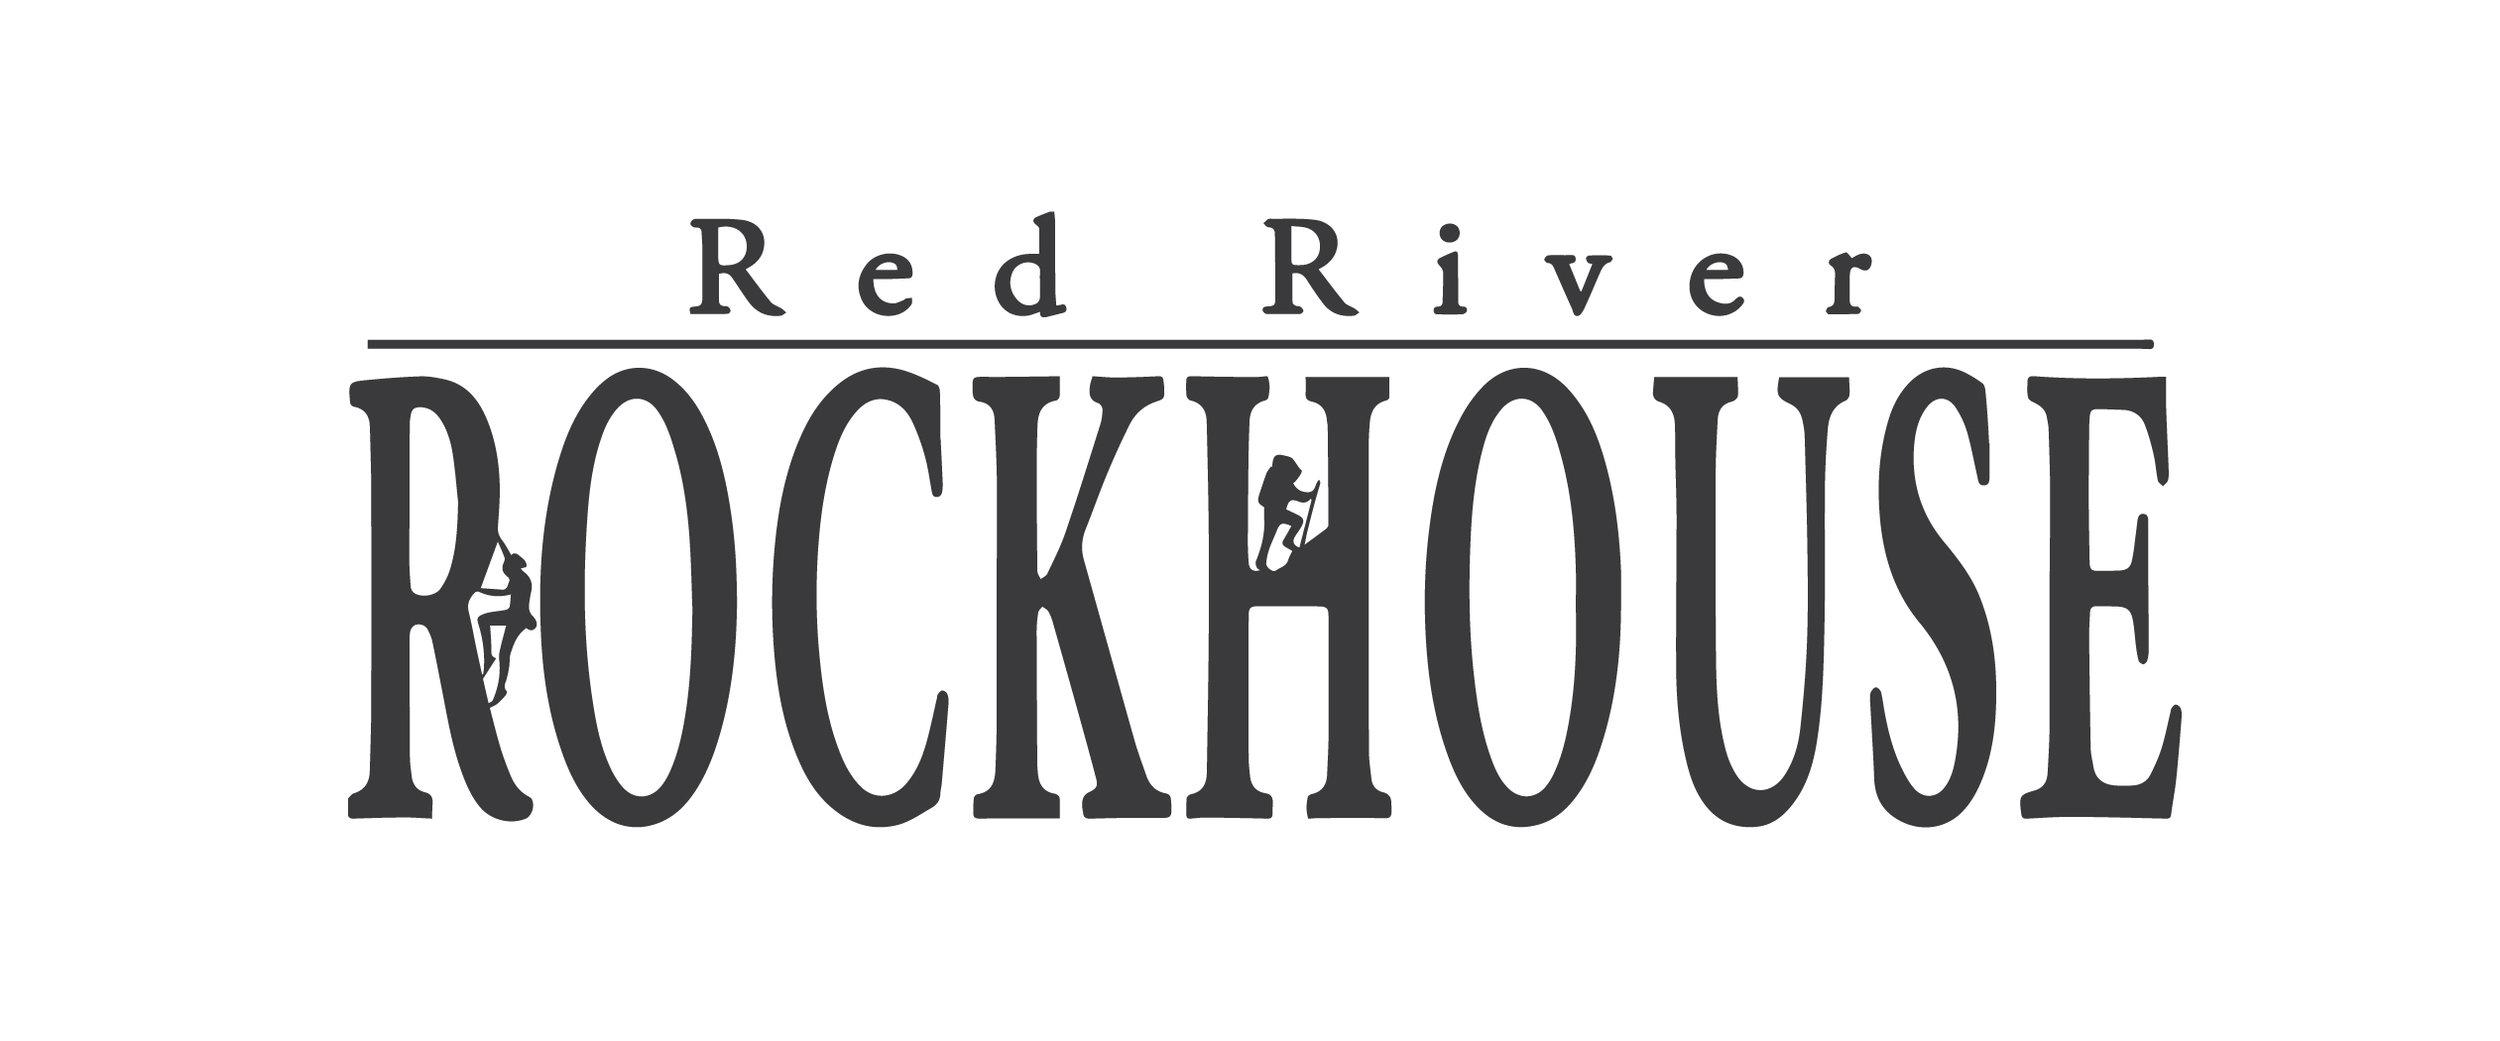 RedRiverRockhouse-01.jpg